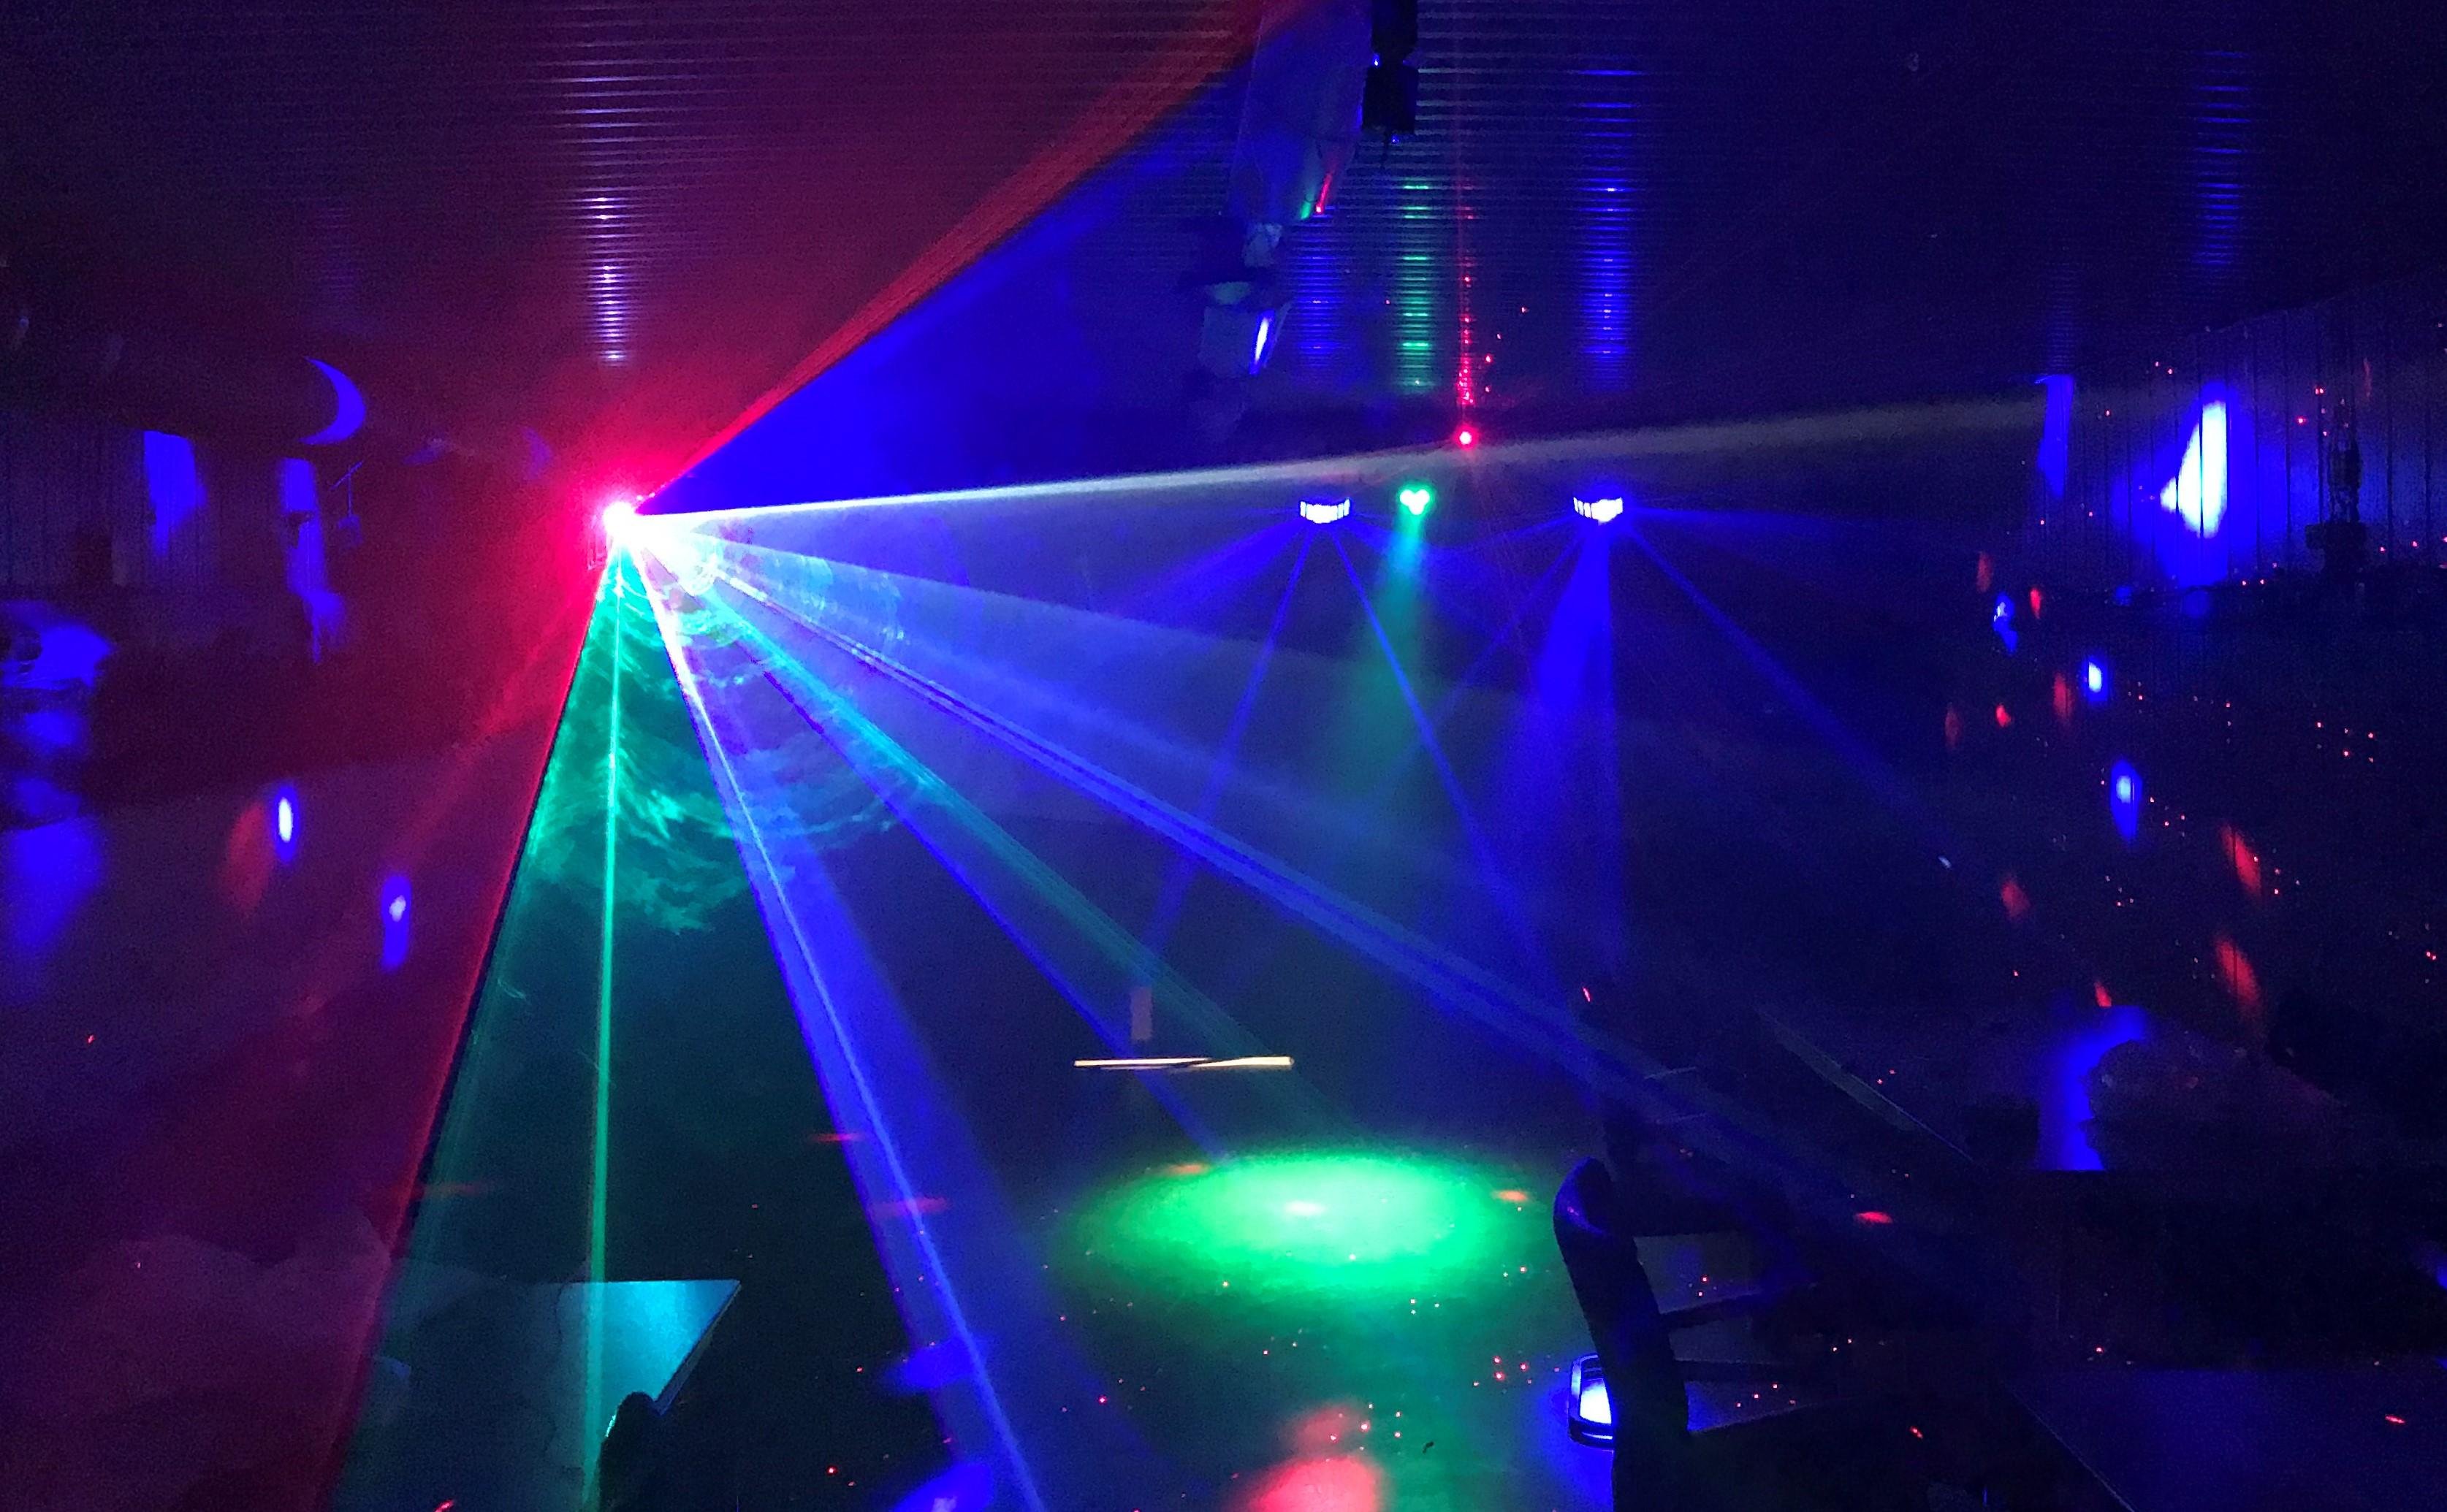 Underholdning med Laser live